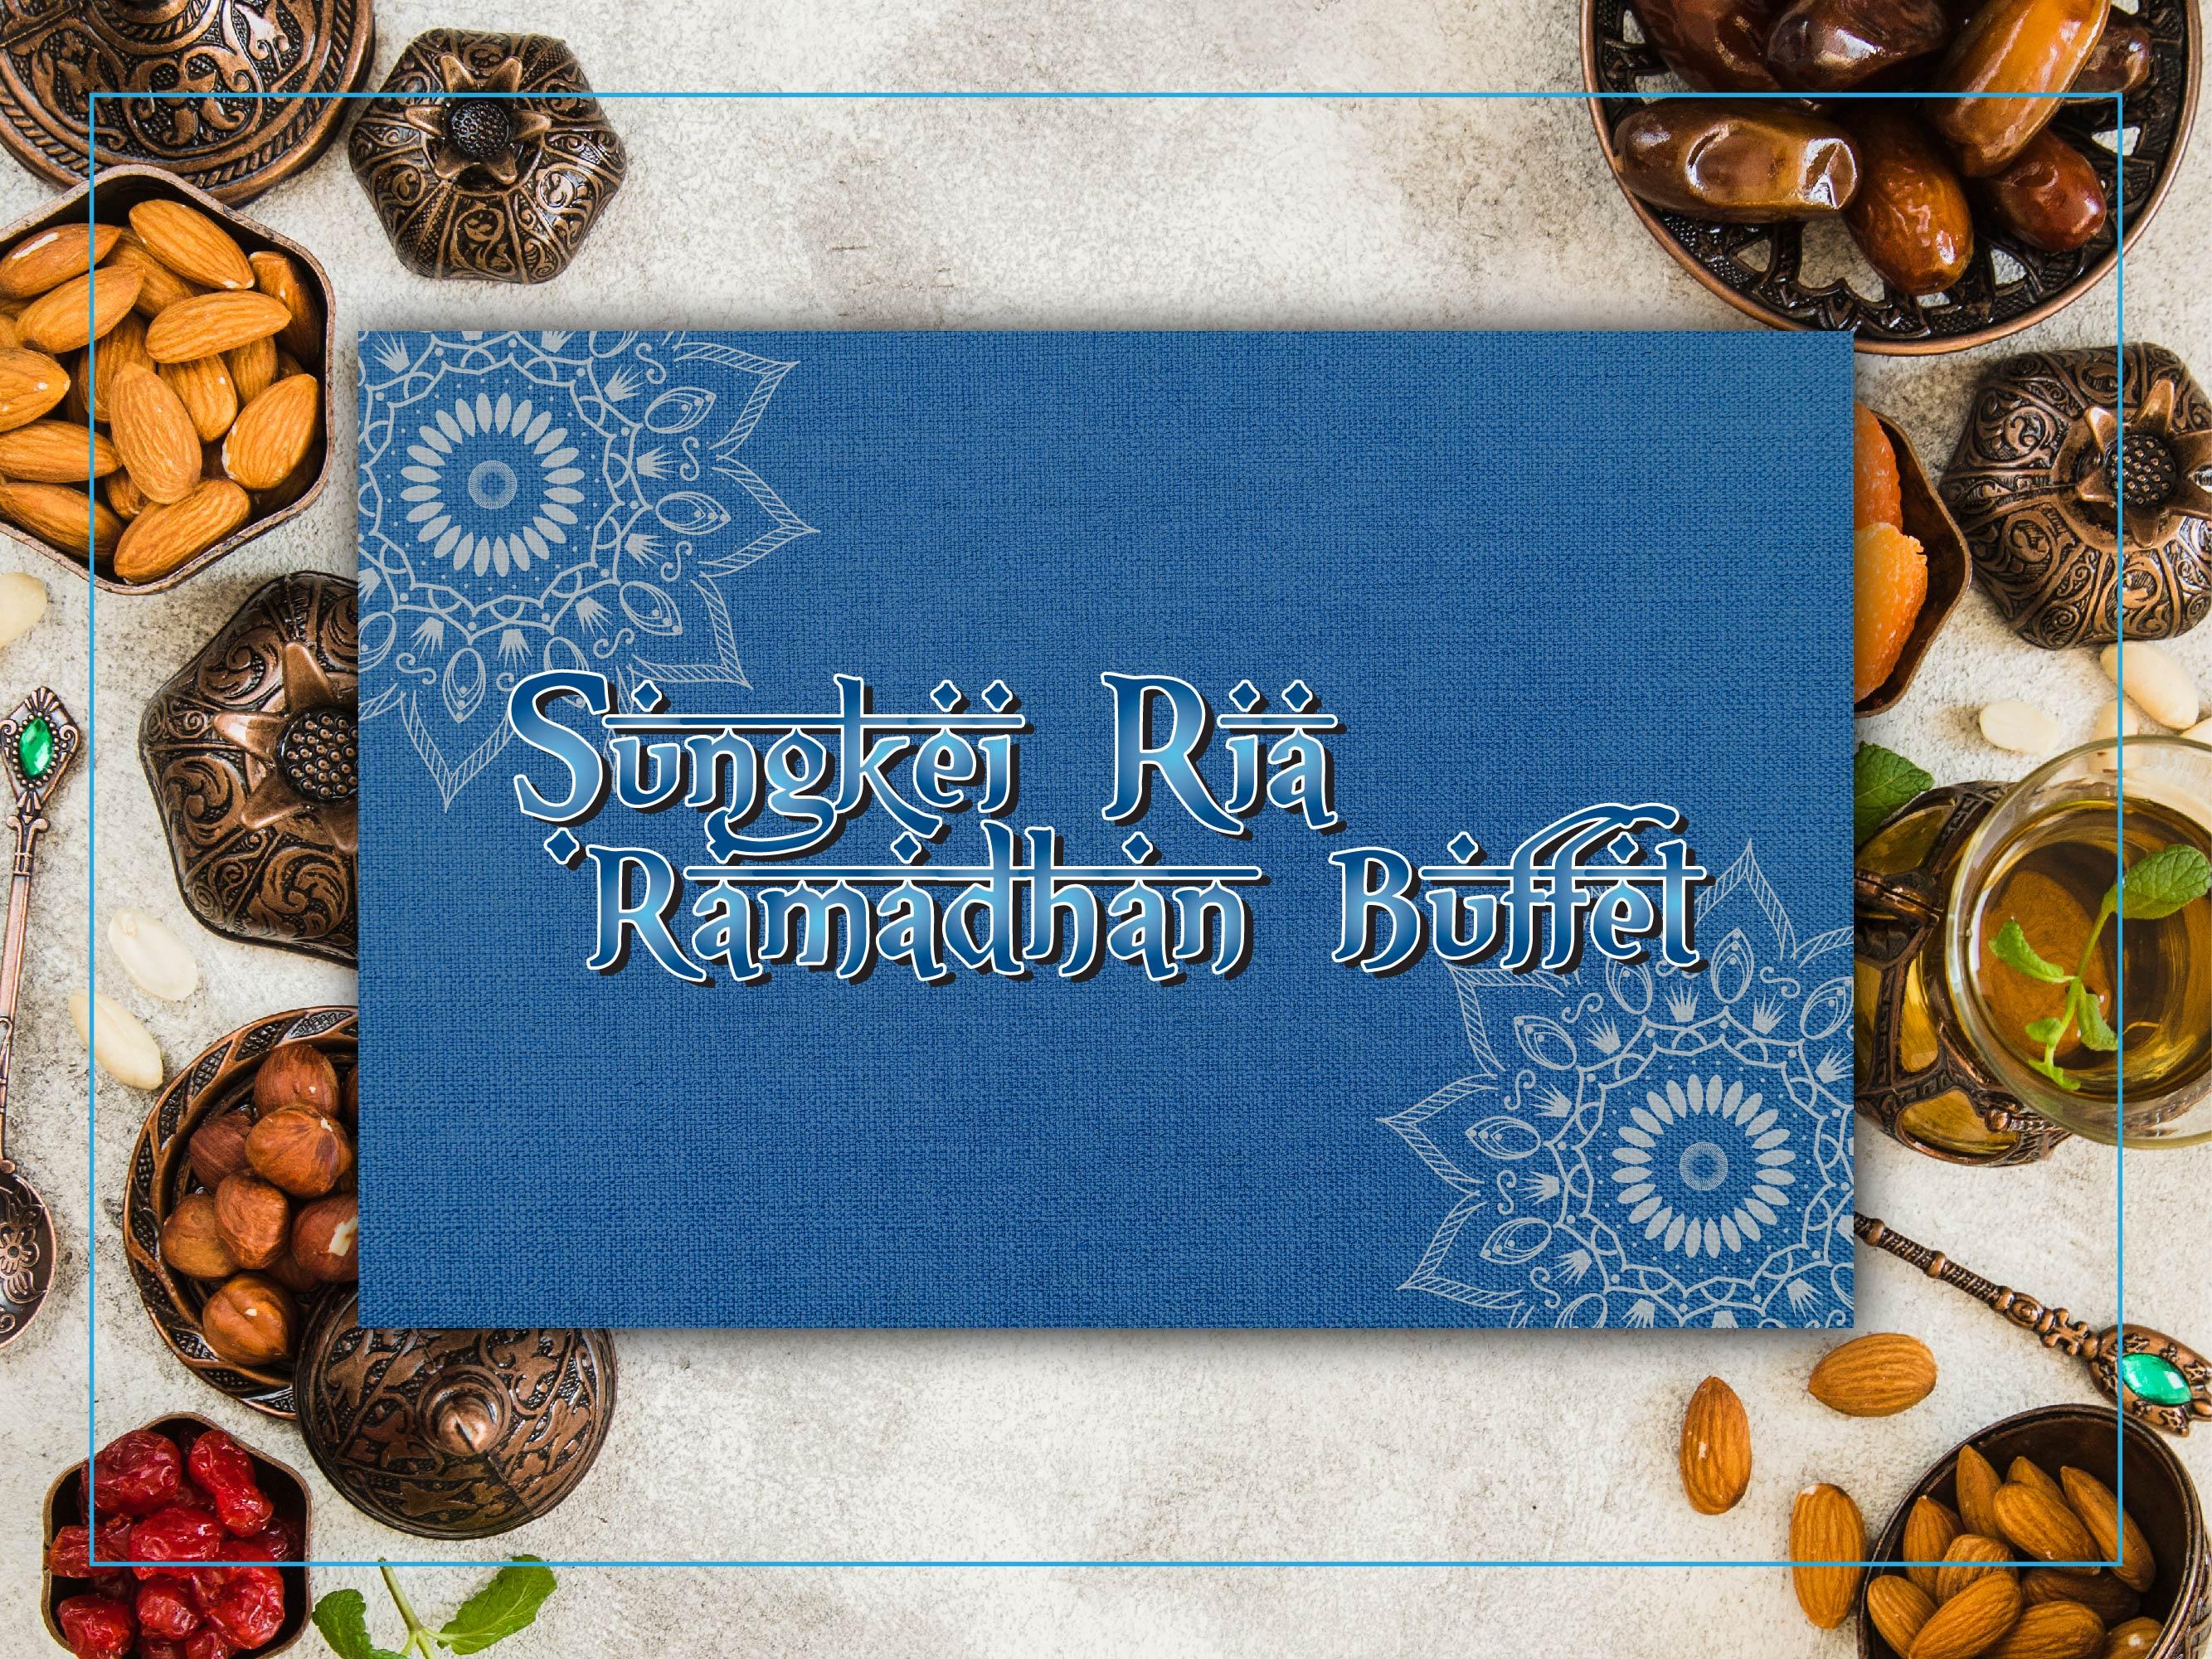 Sungkei Ria Ramadhan Buffet